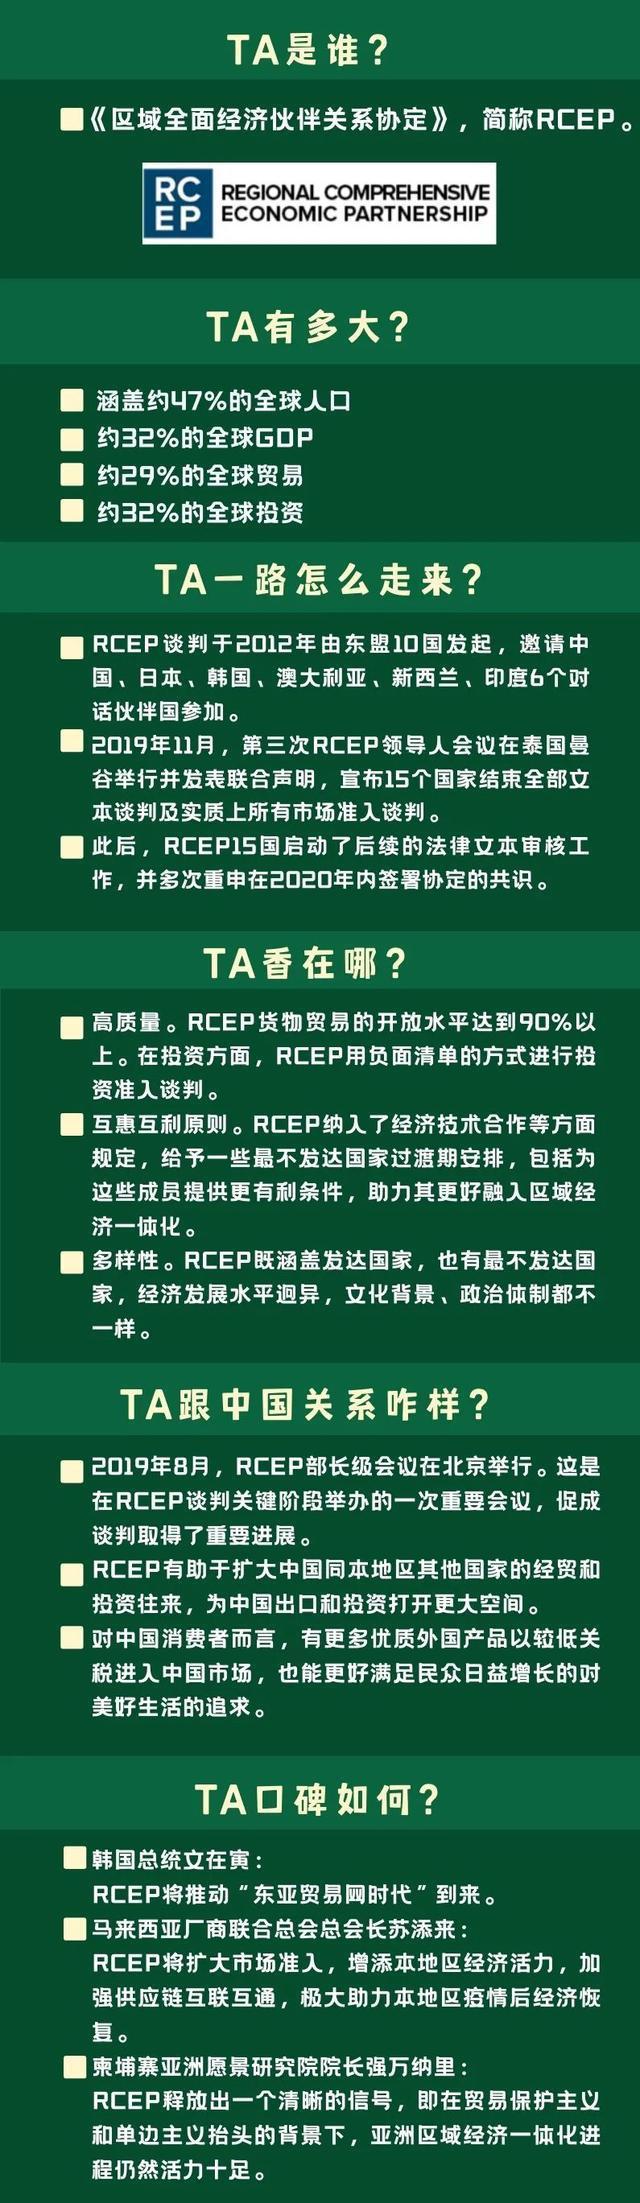 RCEP為疫情下全球經濟復蘇注入新動力